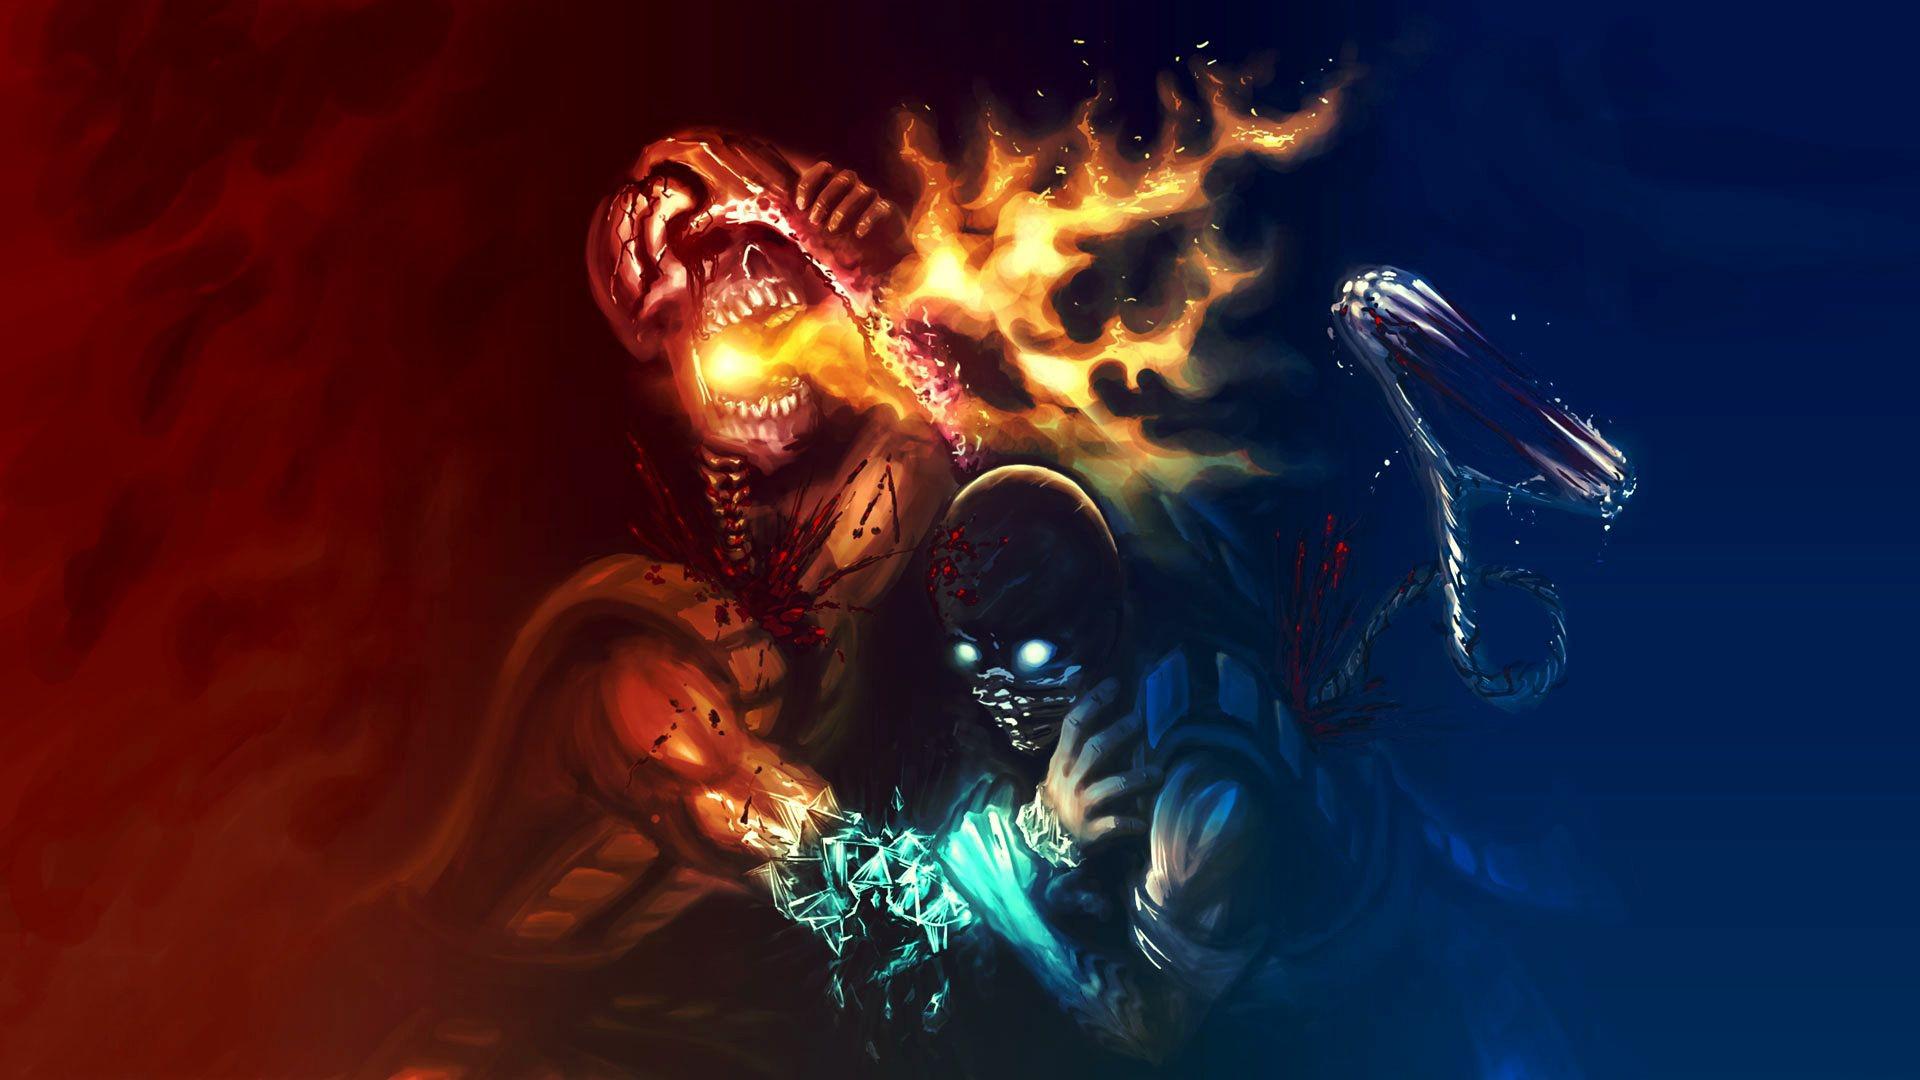 Mortal Kombat Hd Wallpaper Background Image 1920x1080